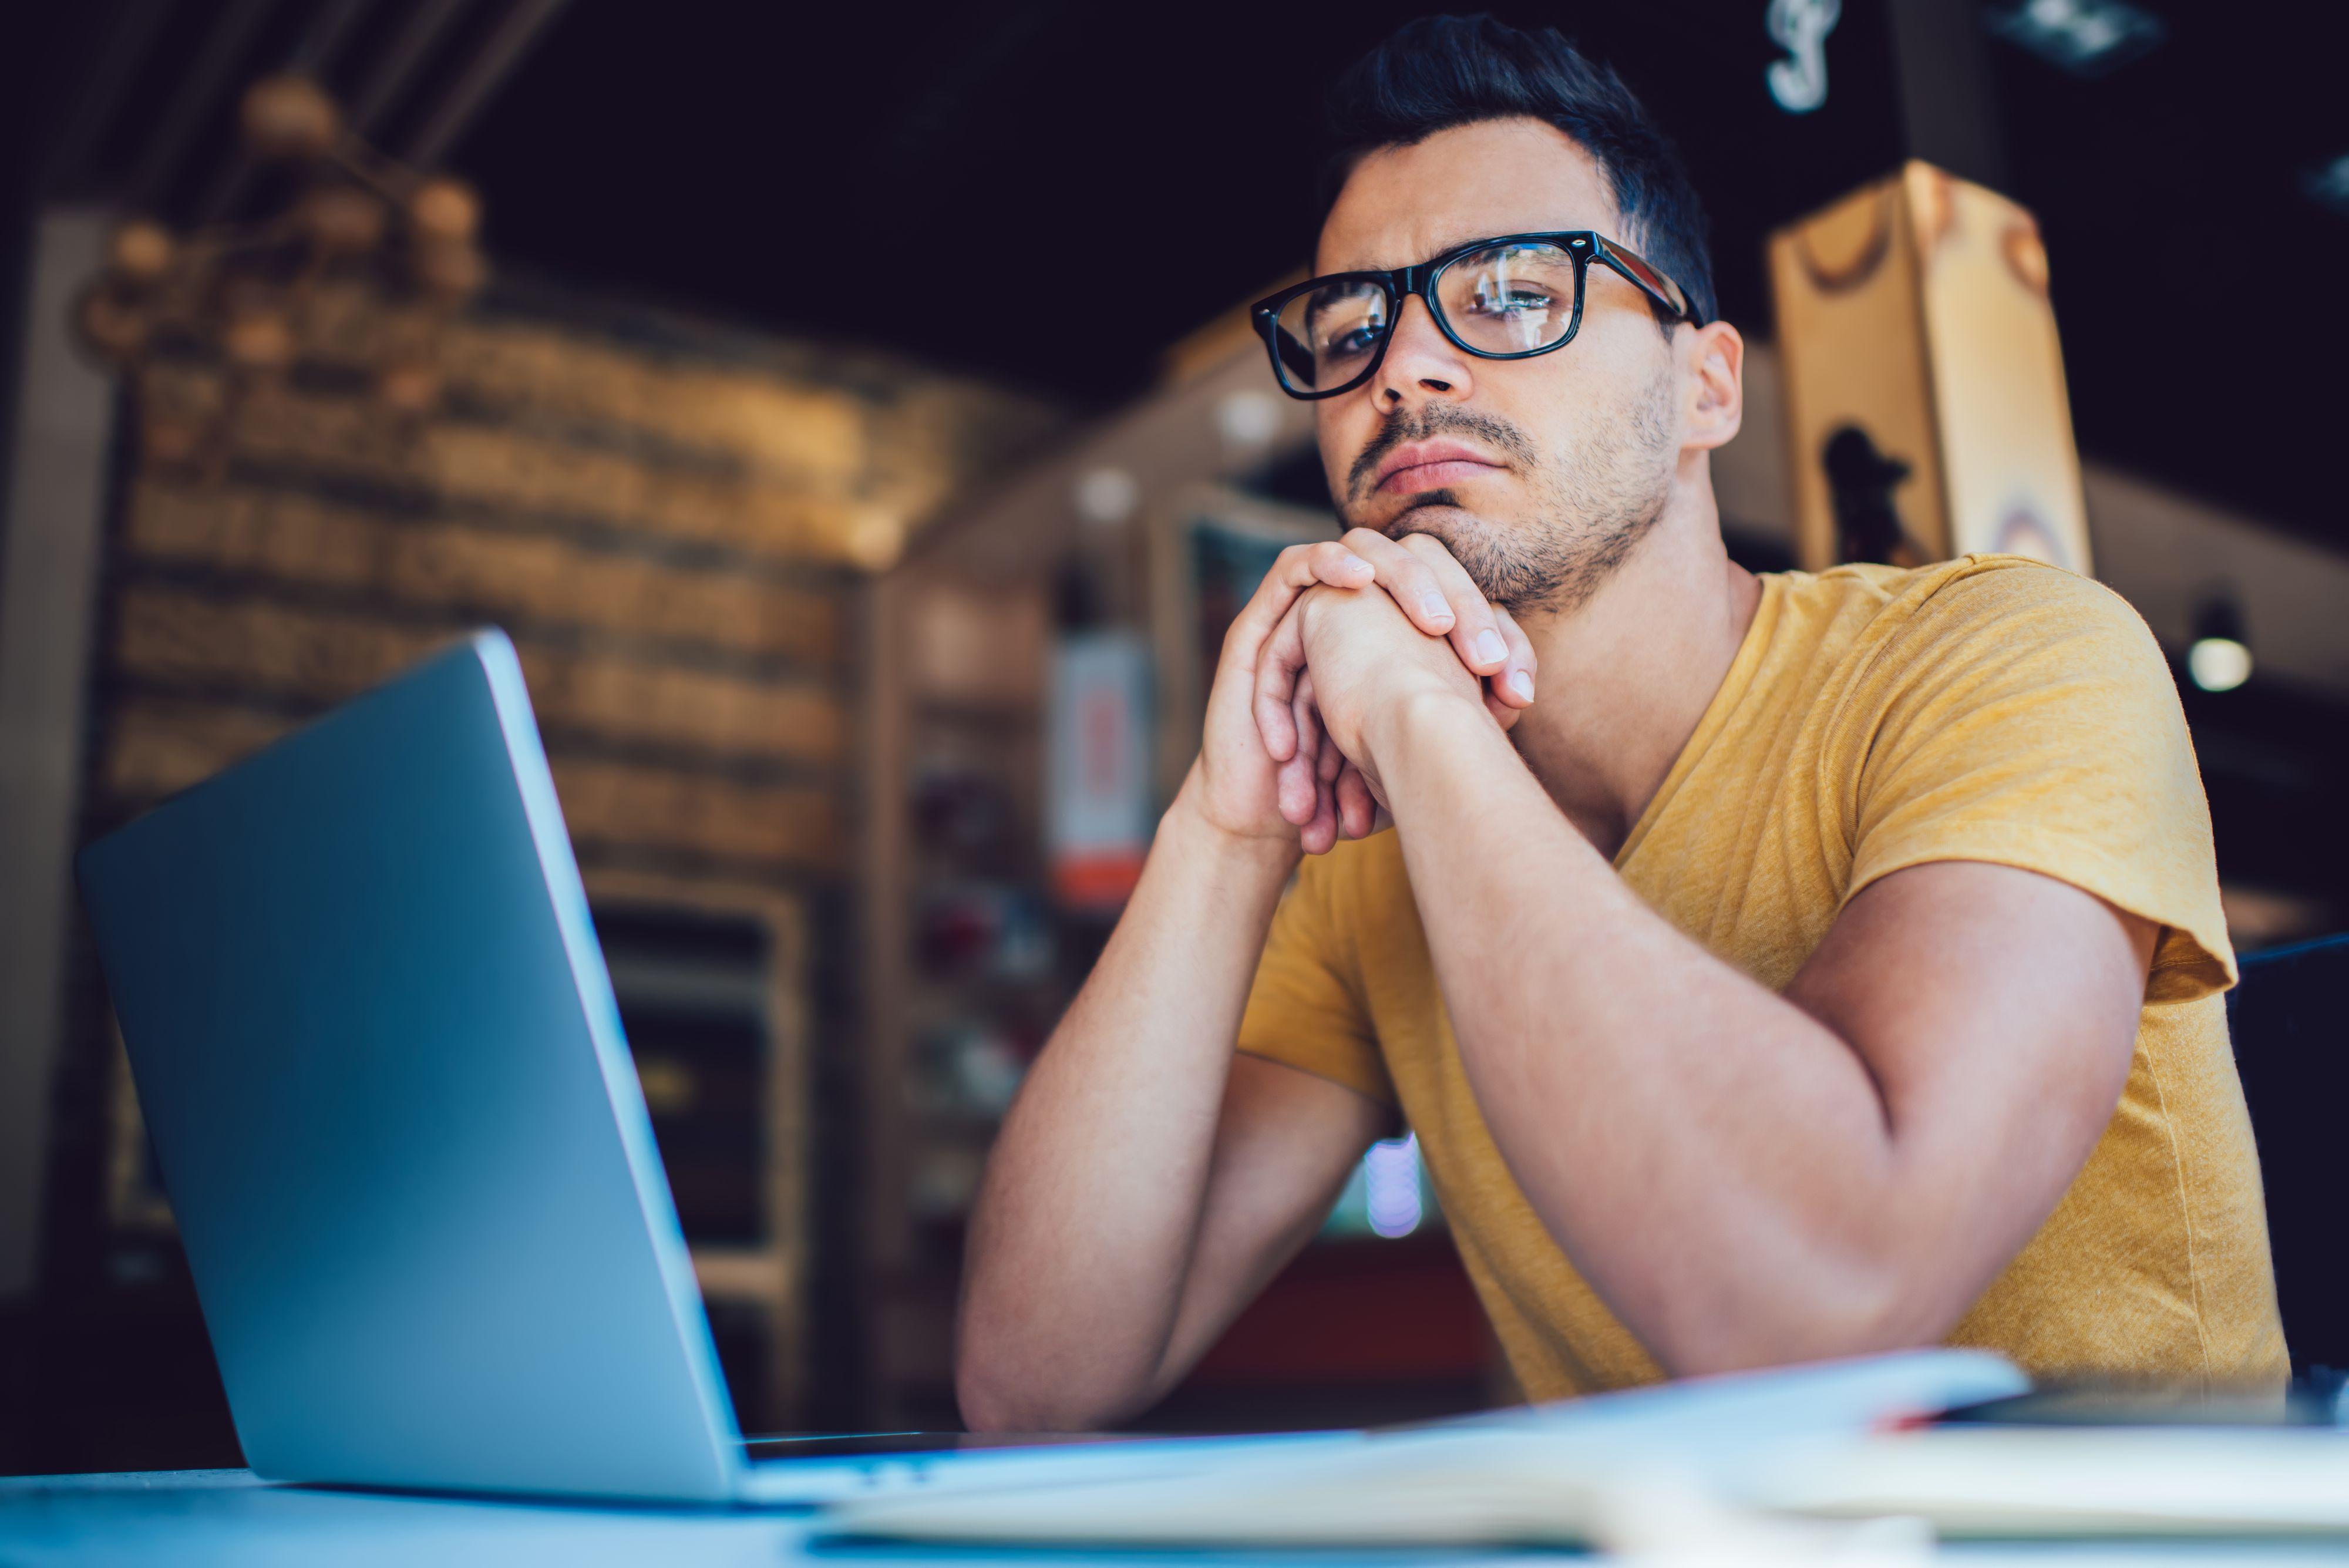 Home office ma coraz mniej zwolenników (Fot. Shutterstock)